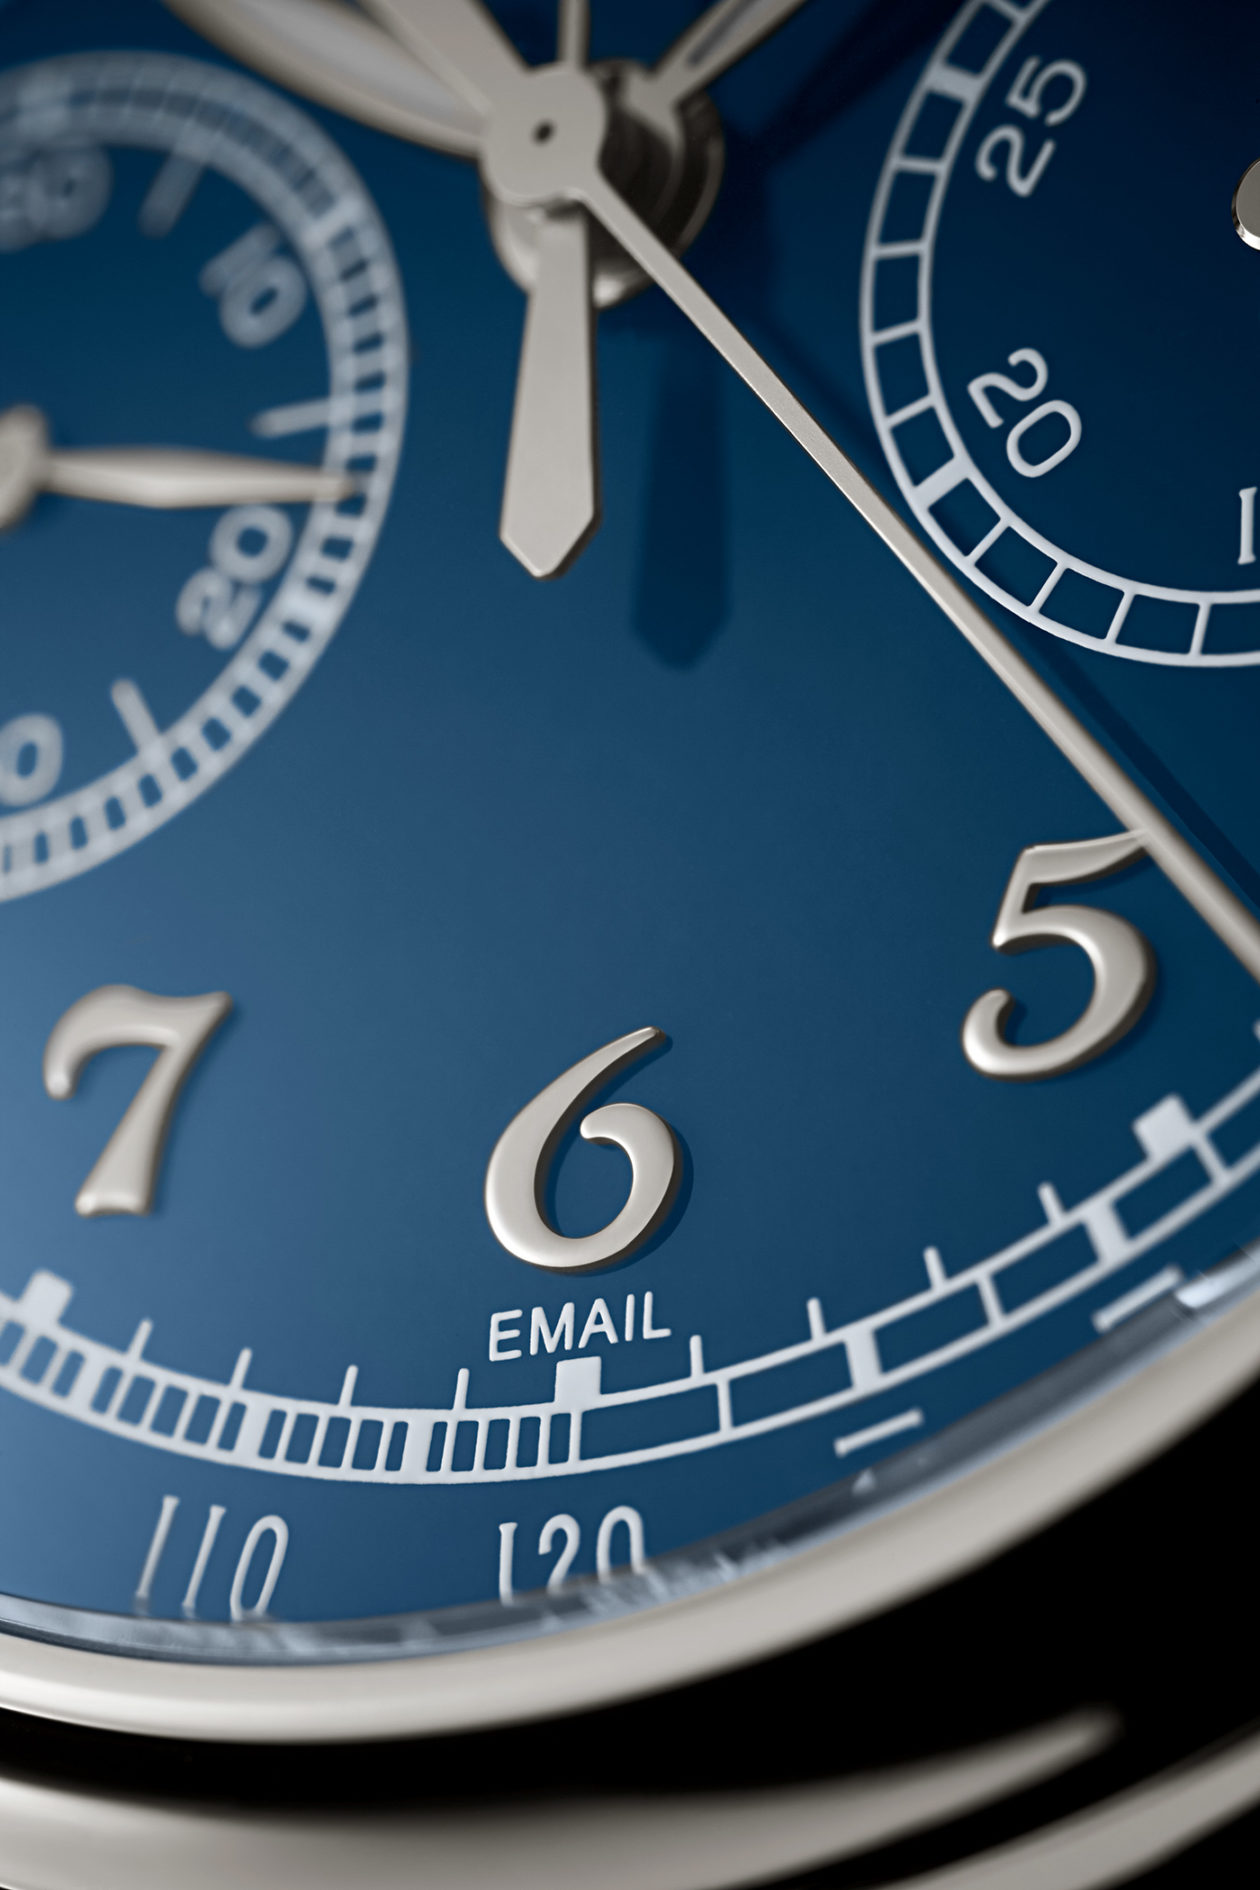 Patek Philippe Ref. 5370P Split-Seconds Chronograph